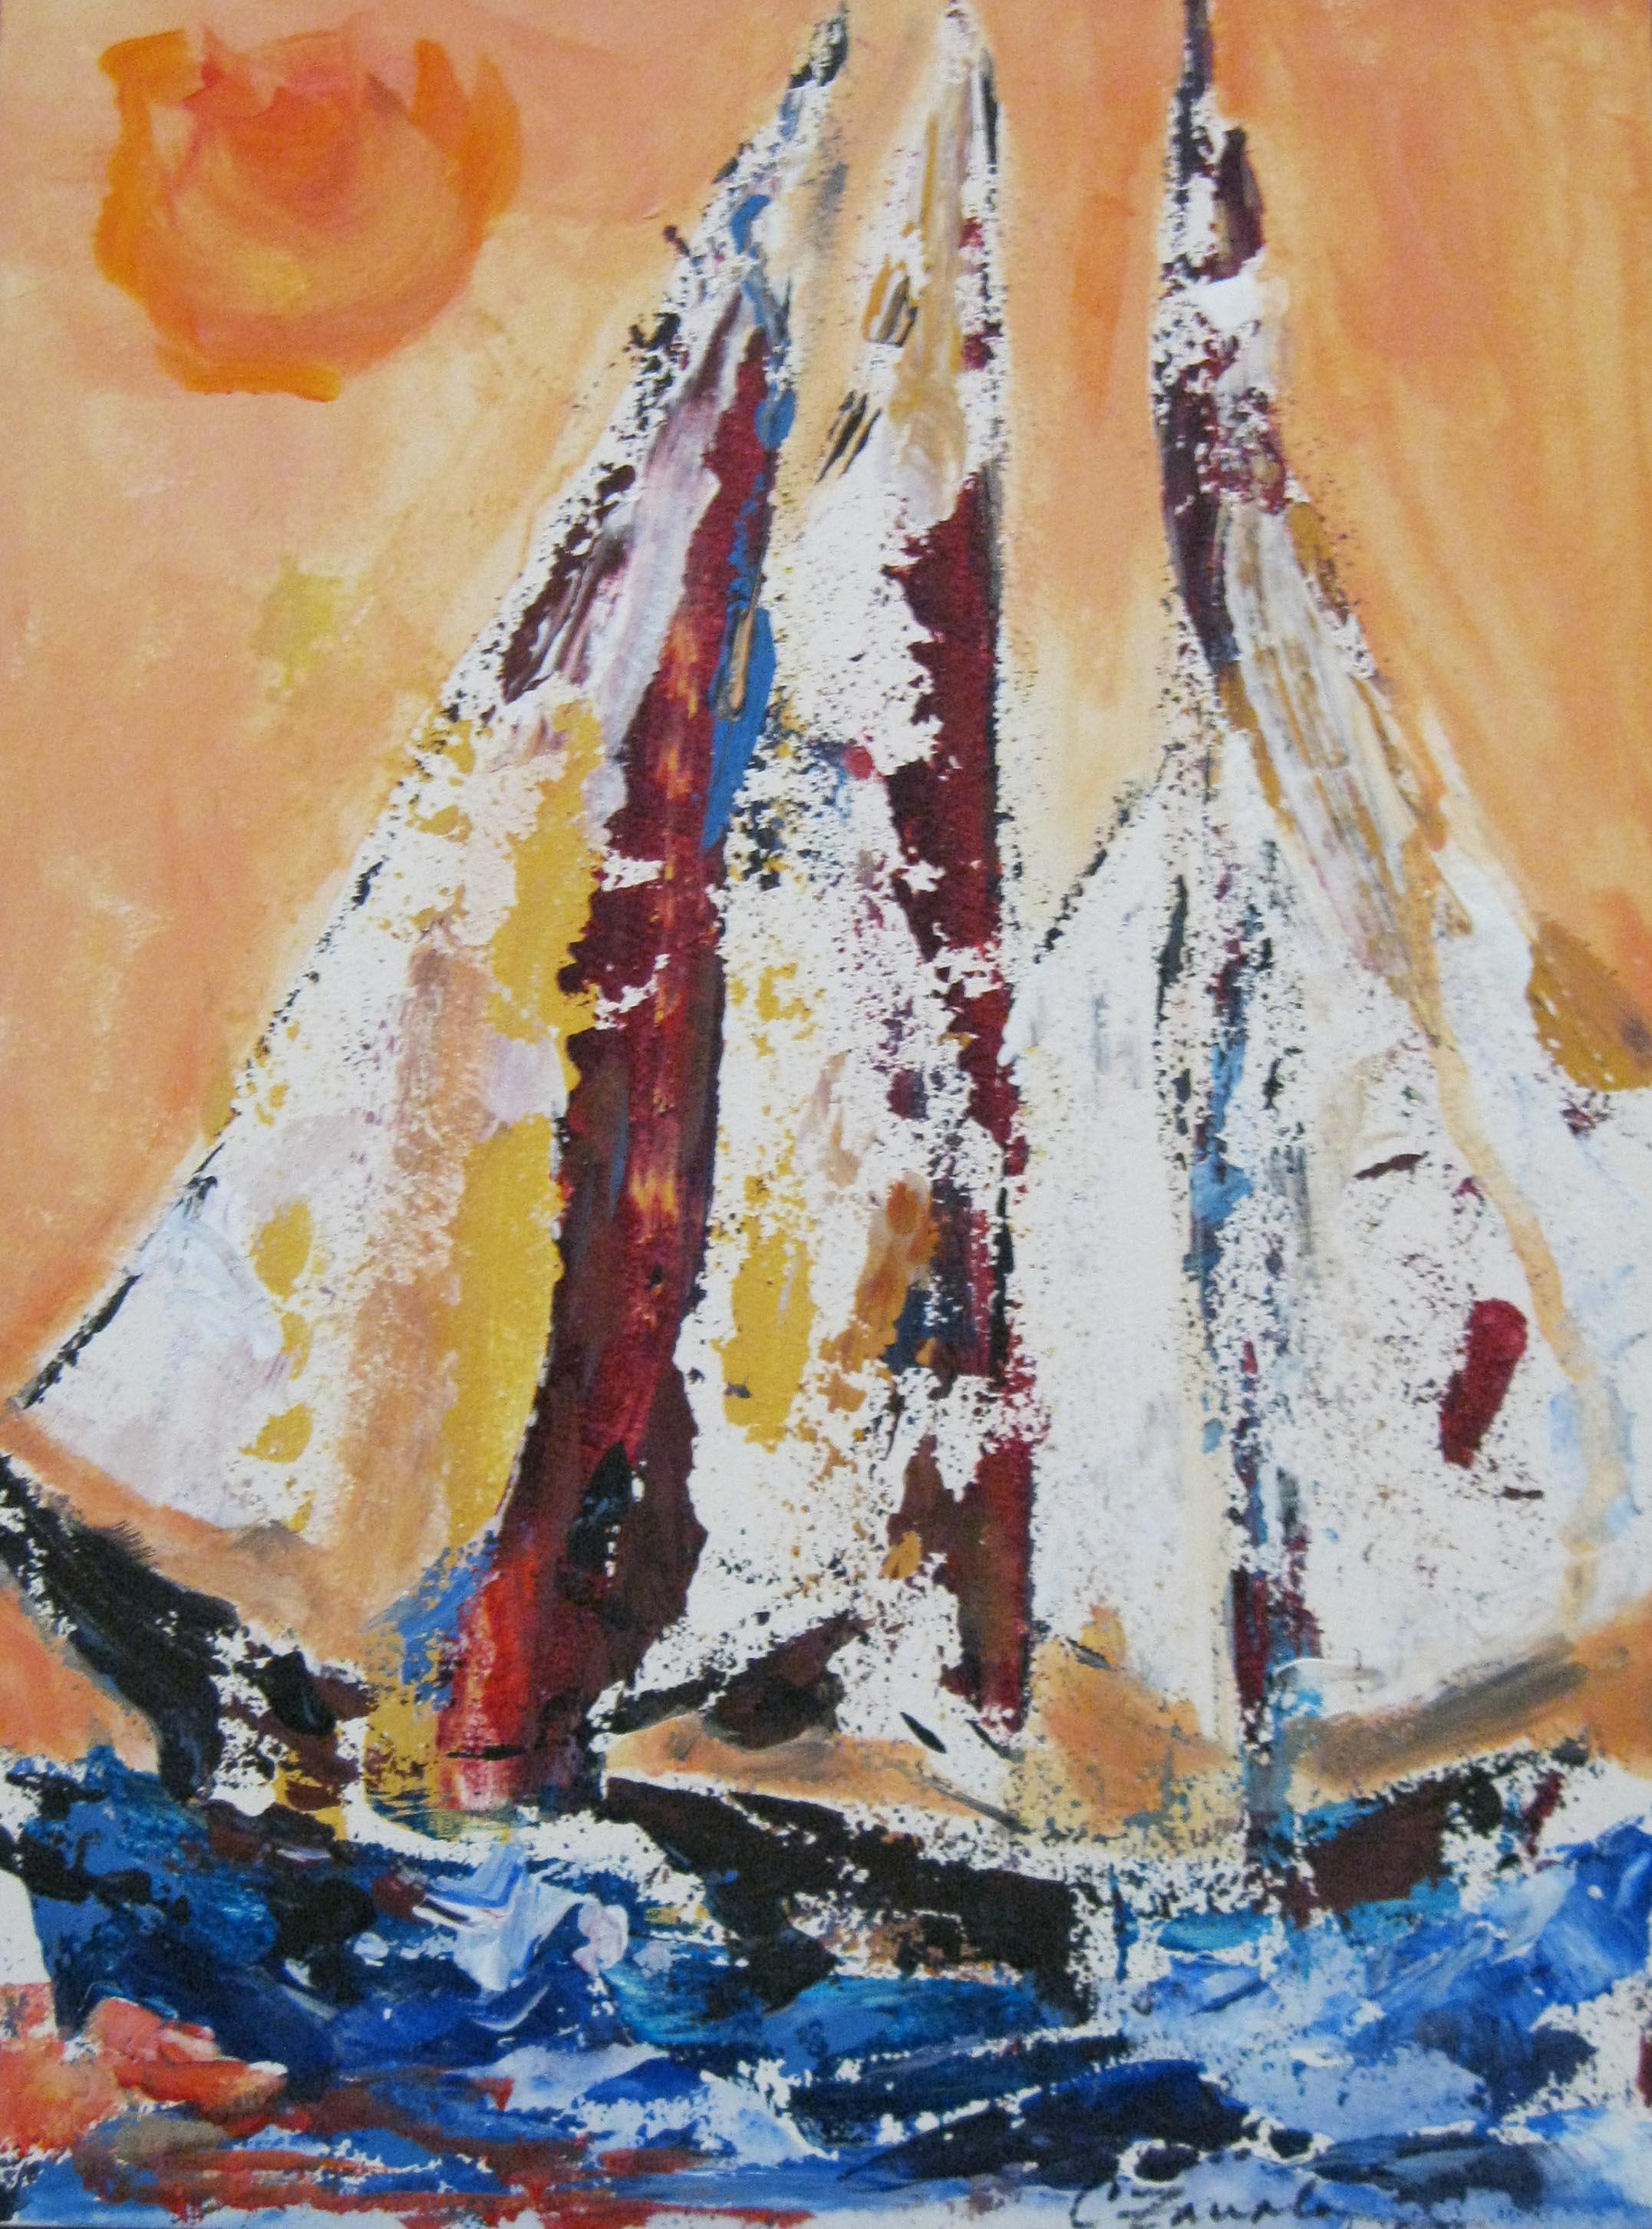 Sun and Sails